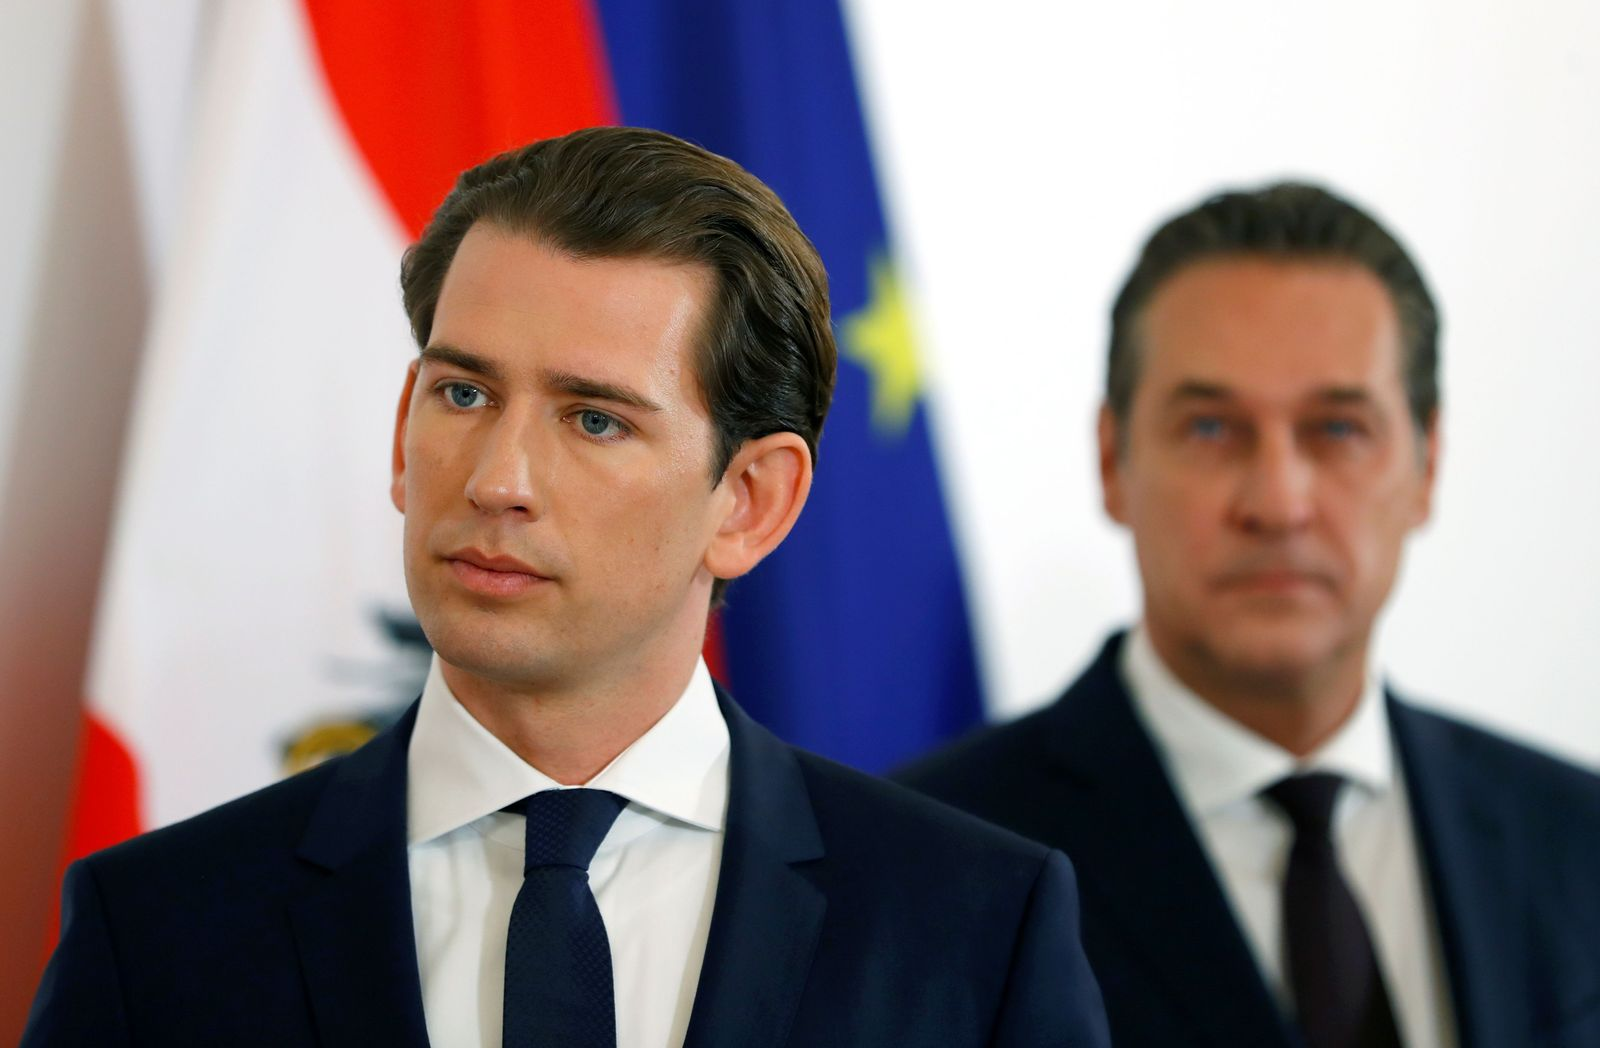 Sebastian Kurz/ Heinz-Christian Strache